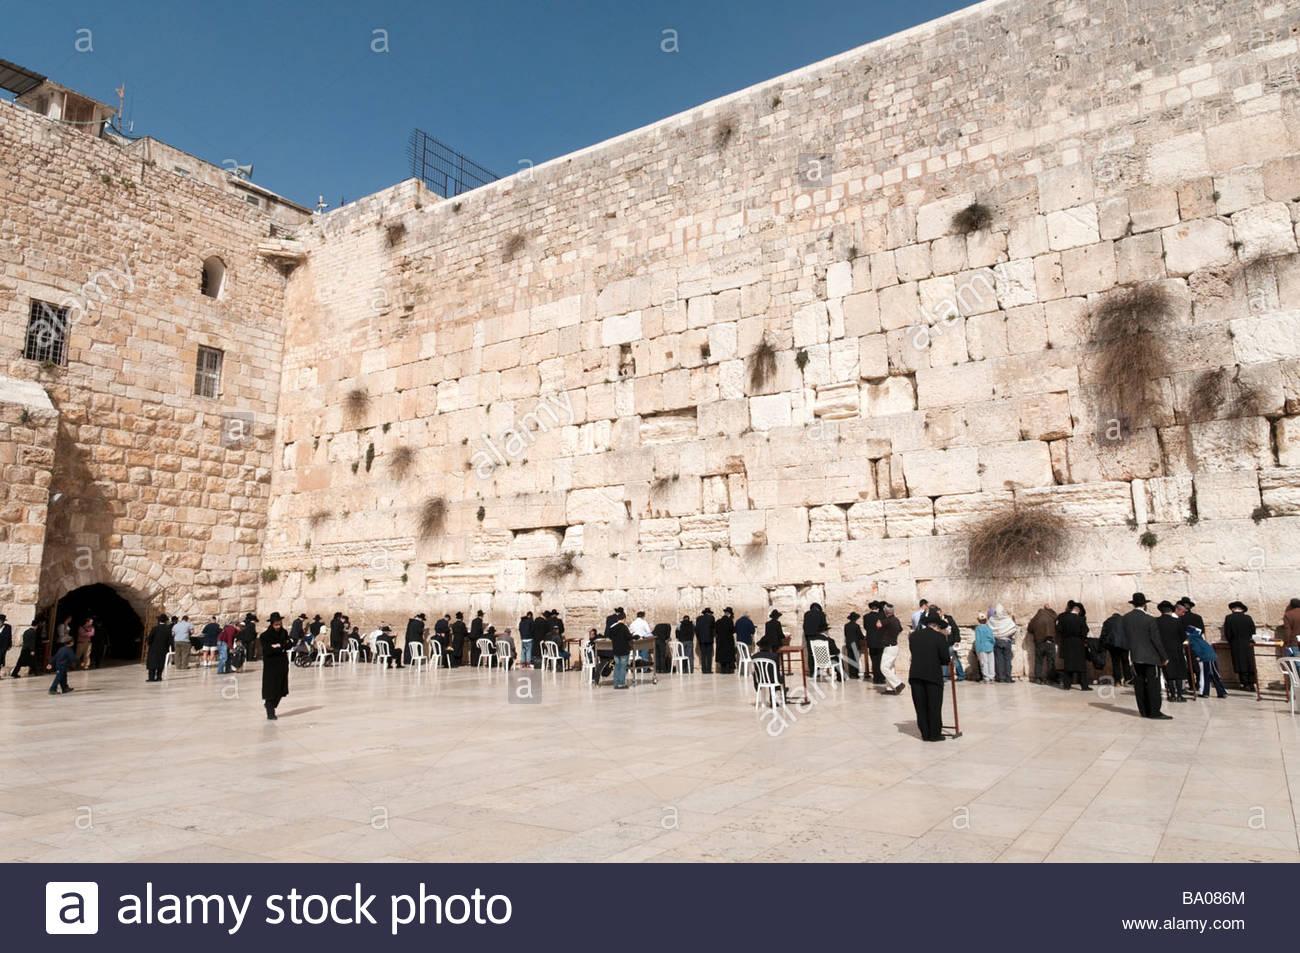 Orthodox Jews praying at the Western Wall, Jerusalem, Israel - Stock Image